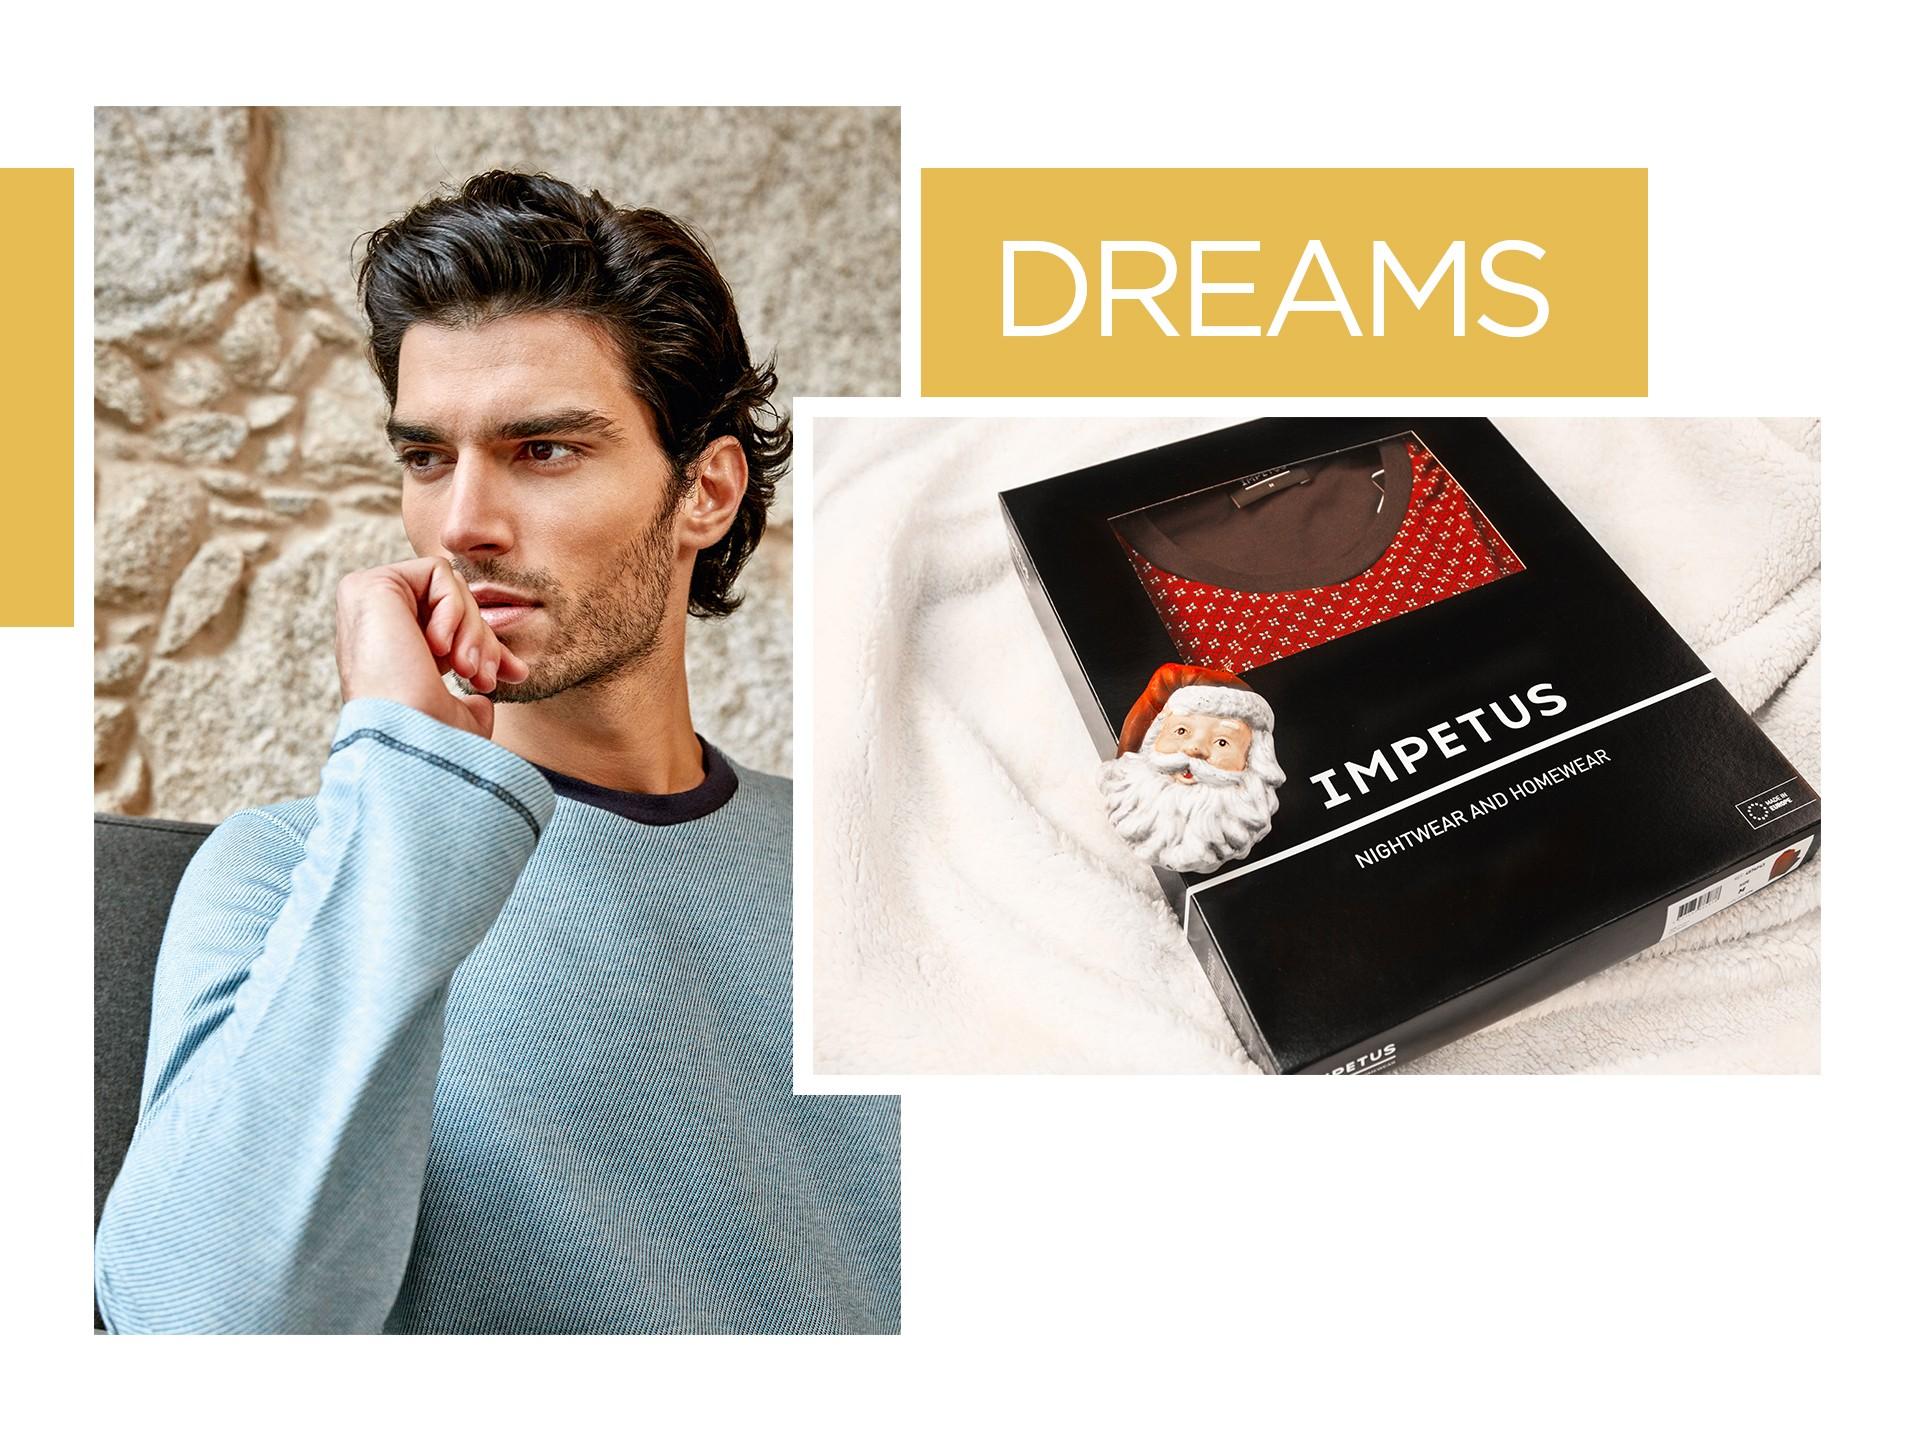 Pajamas to offer | Pajamas and Robes for Men | Impetus